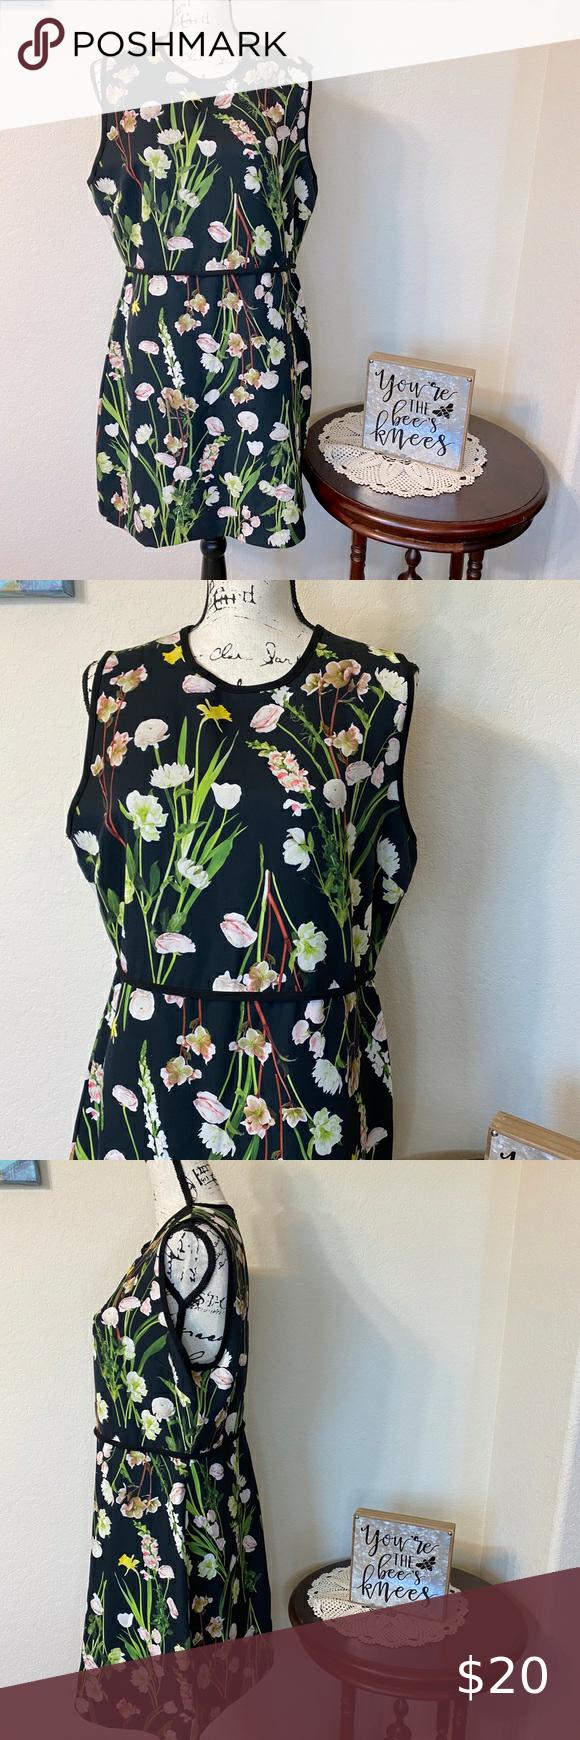 Victoria Beckham For Target Black Floral Dress In 2021 Floral Dress Black Lace White Dress Soft Surroundings Tunic [ 1740 x 580 Pixel ]